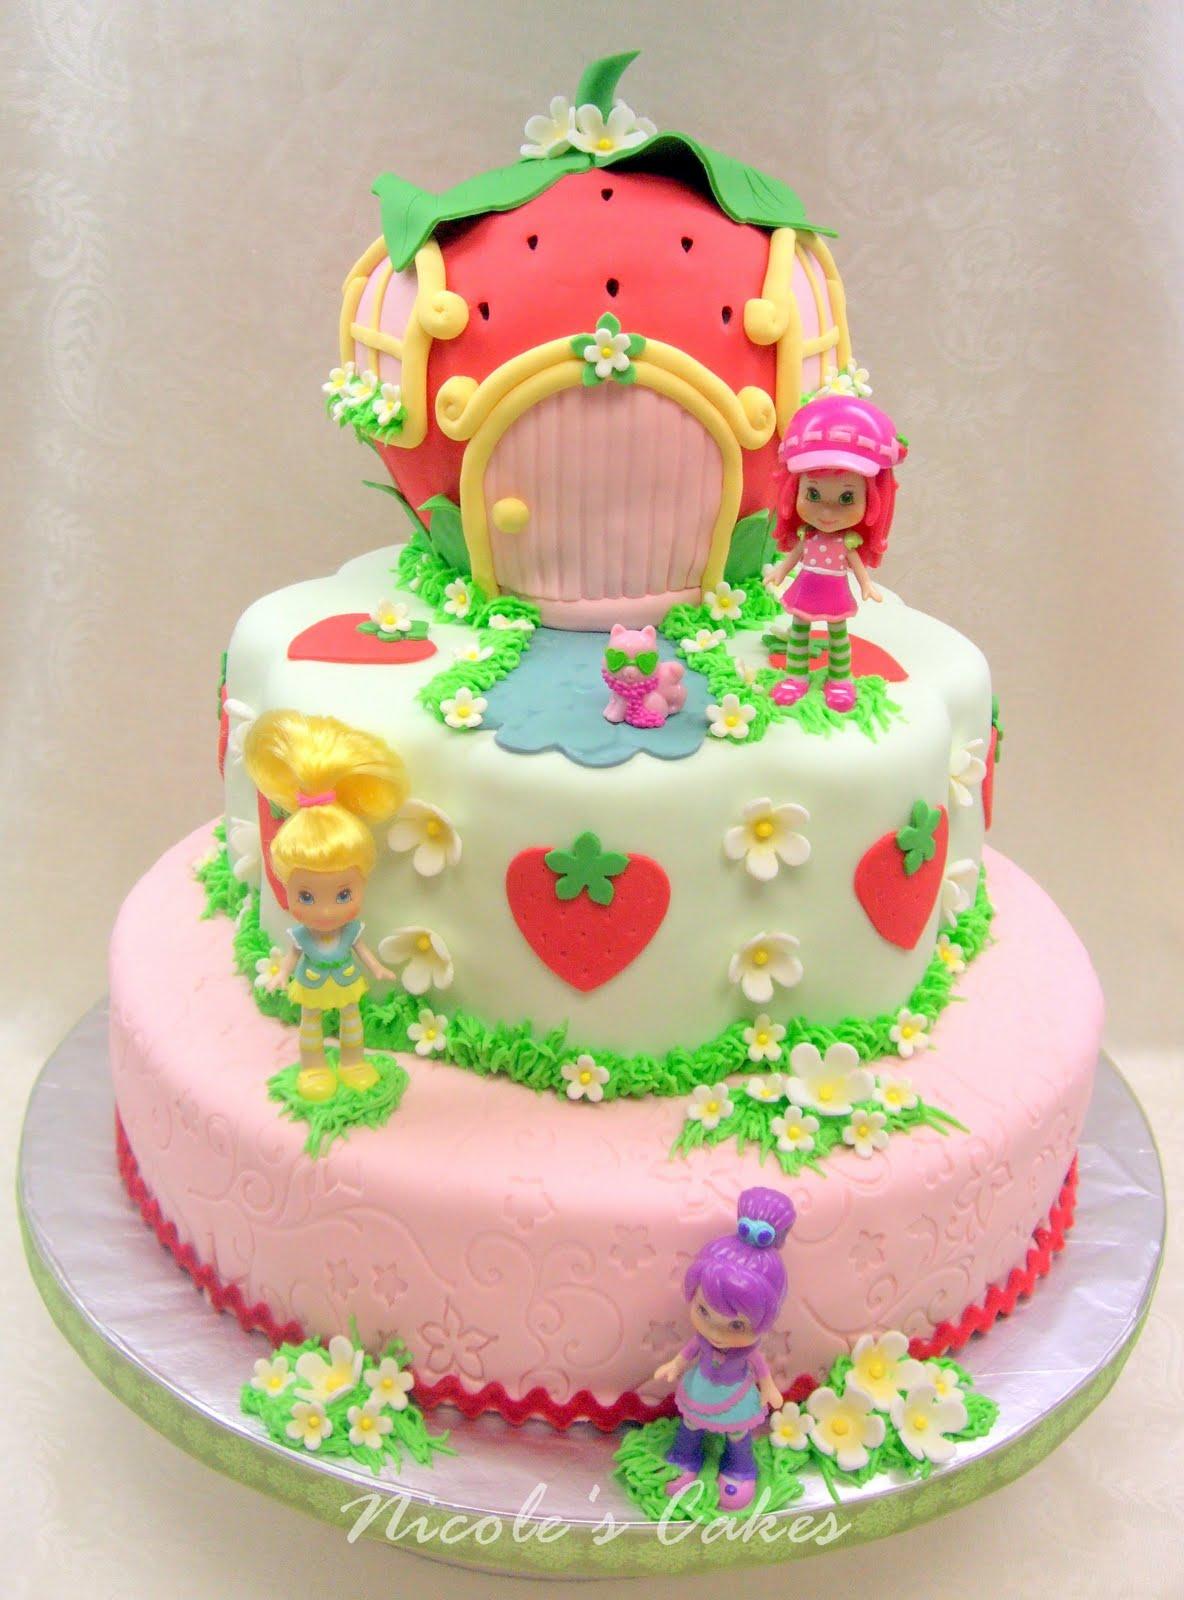 12 Strawberry Shortcake Bday Cakes Photo Strawberry Shortcake